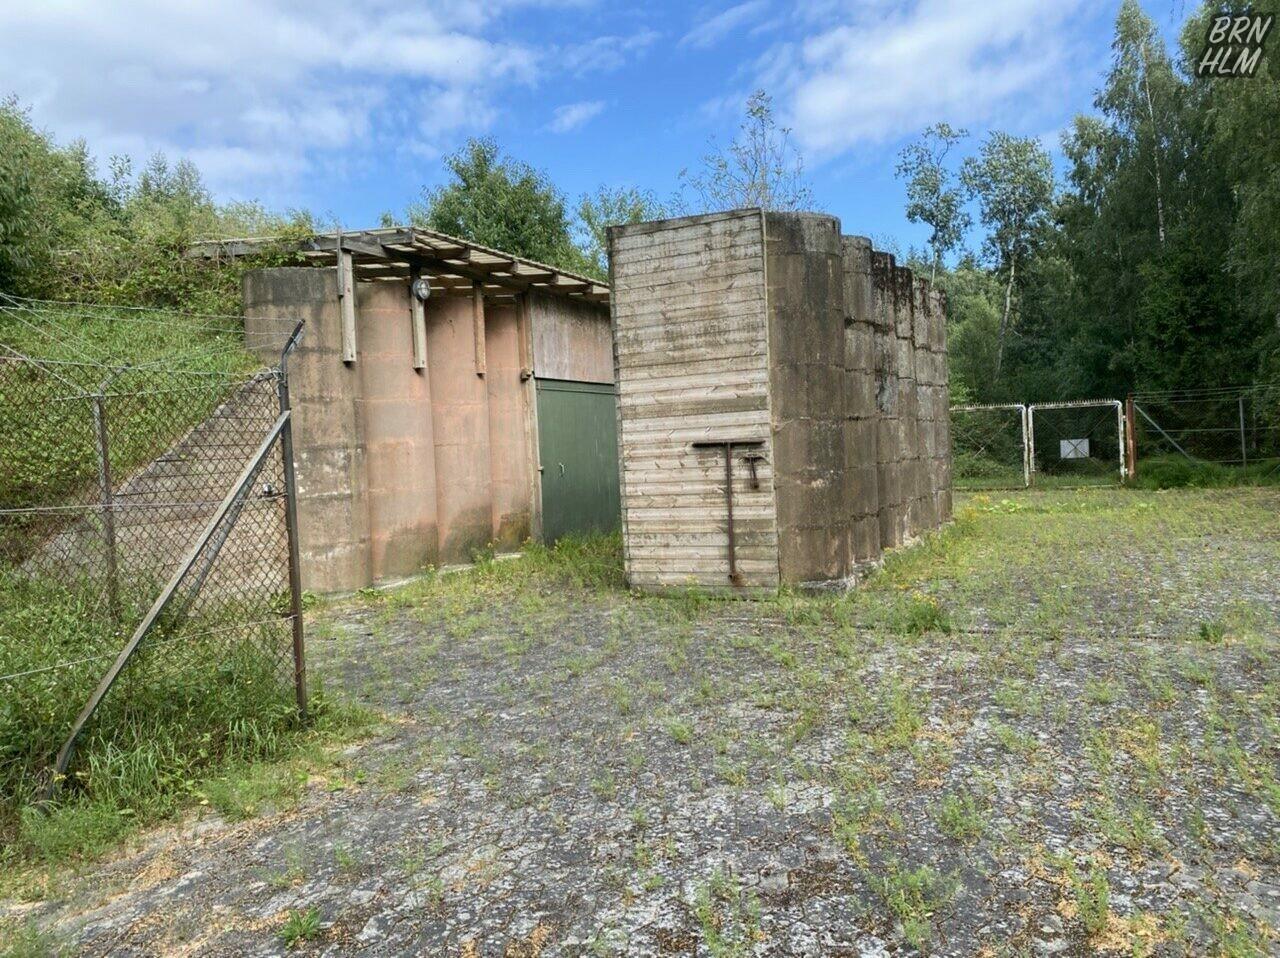 Krigsgas depotet i Vestermarie plantage - 2021